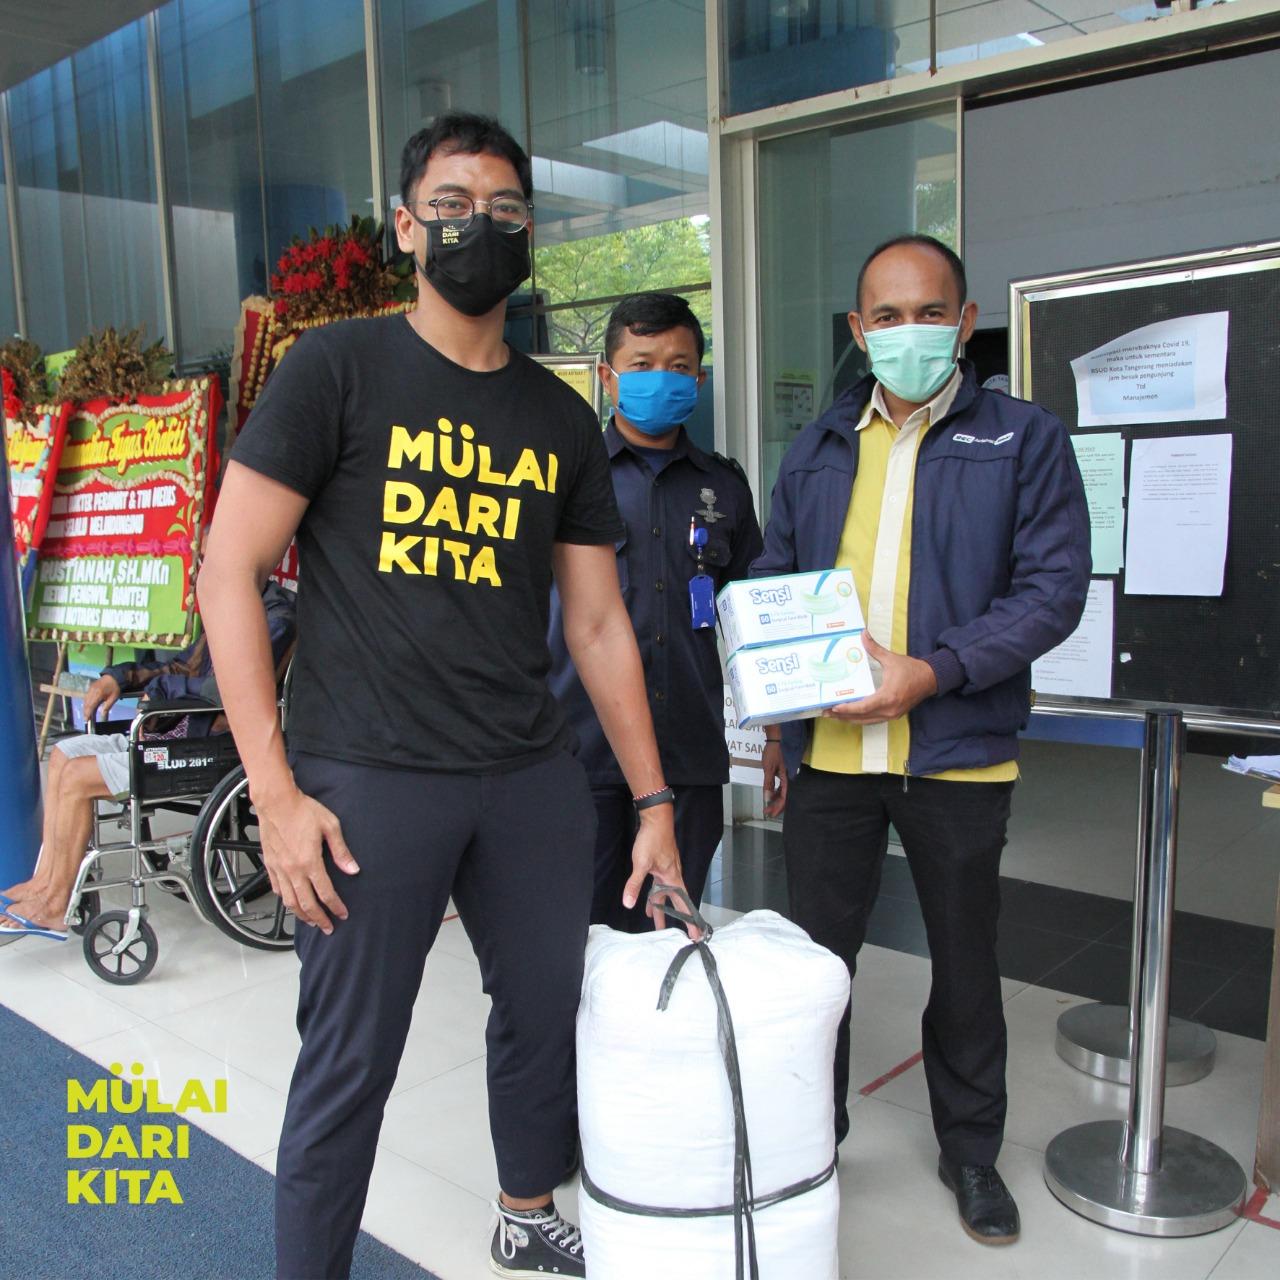 #MulaiDariKita Perpanjang Penggalangan Donasi Hingga Akhir April 2020 Untuk Terdampak Pandemi Covid-19